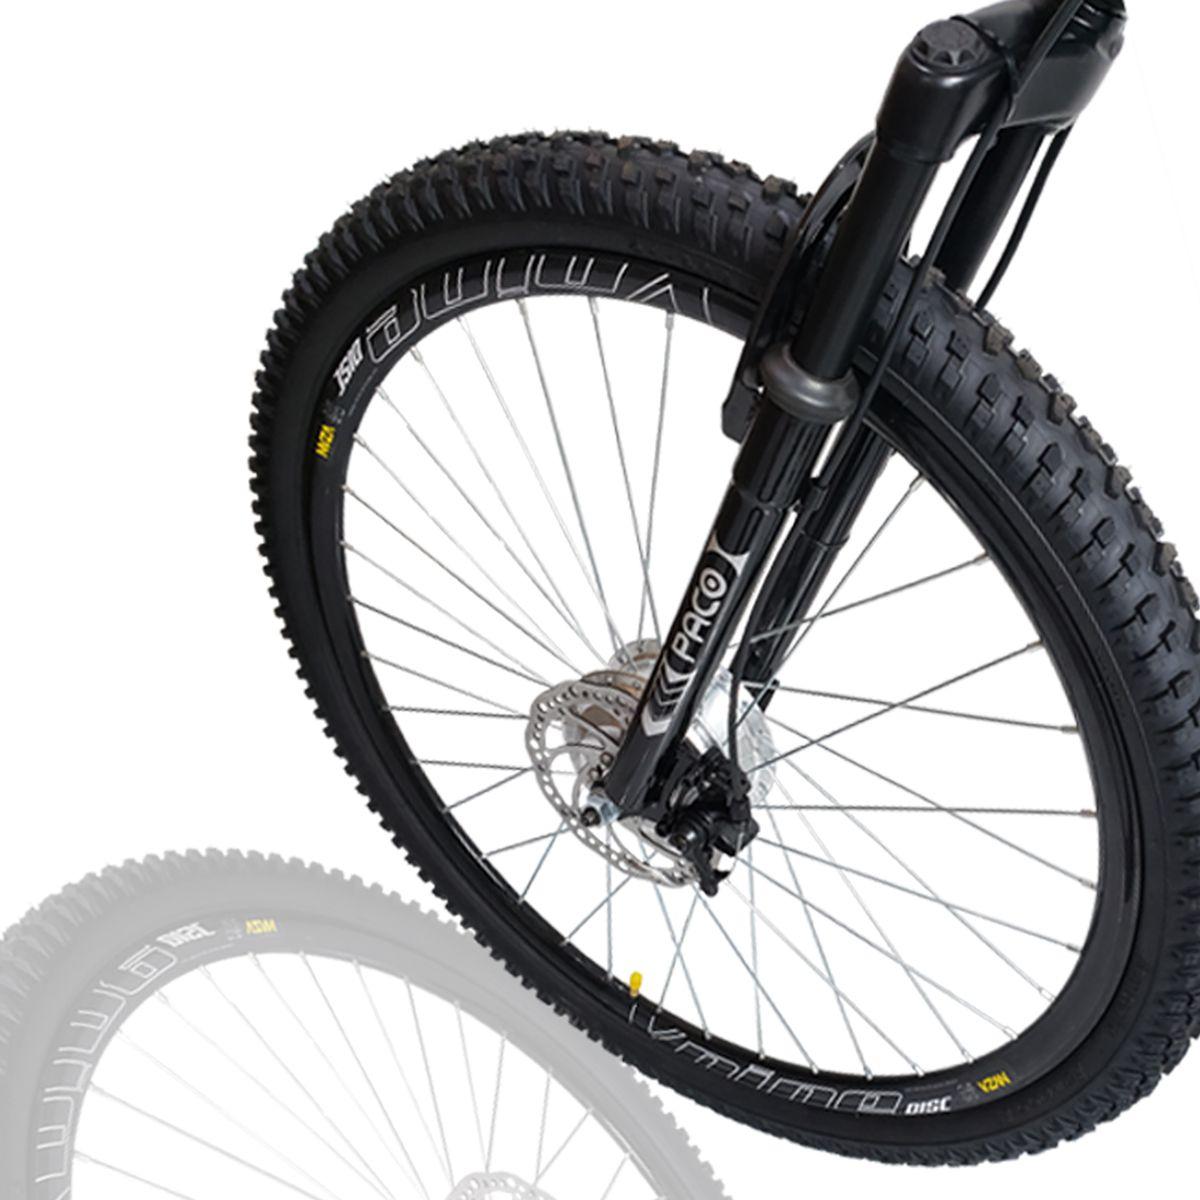 Bicicleta Elétrica Aro 29 Alumínio Bateria de LÍTIO TecUltra 3.0 - 500 Watts